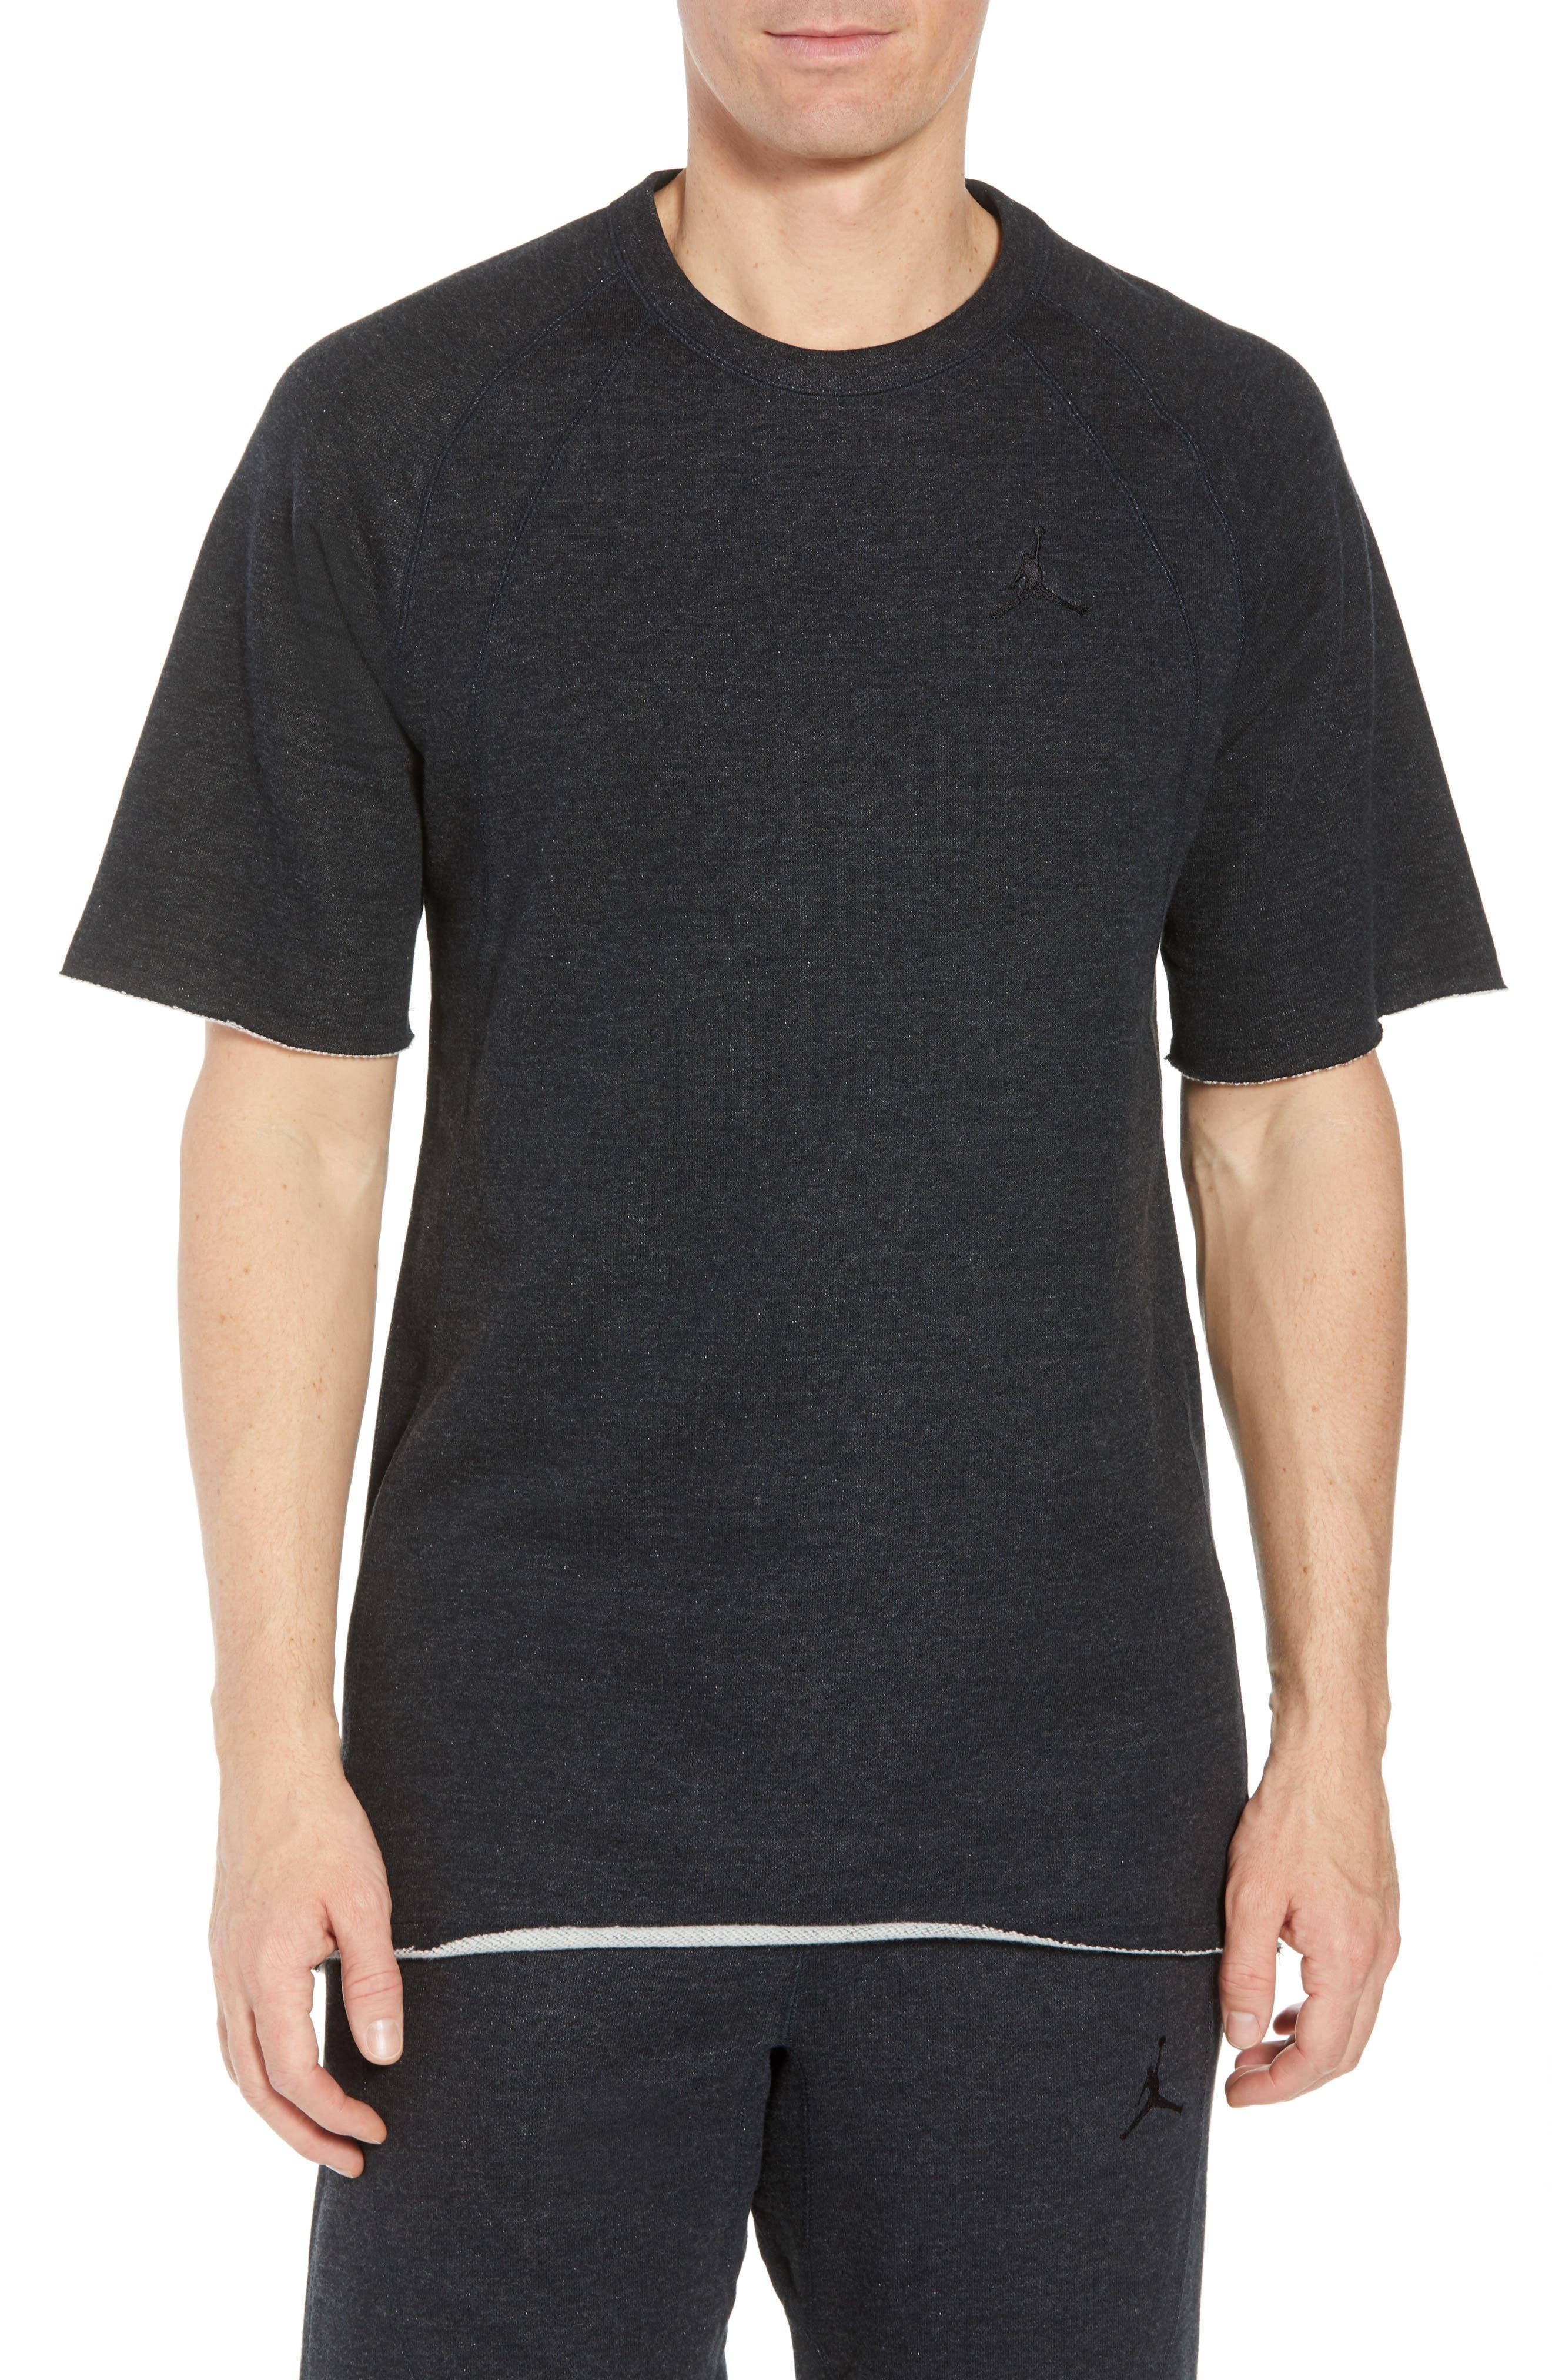 Wings Light Short Sleeve Sweatshirt,                             Main thumbnail 1, color,                             Black Heather/ Black